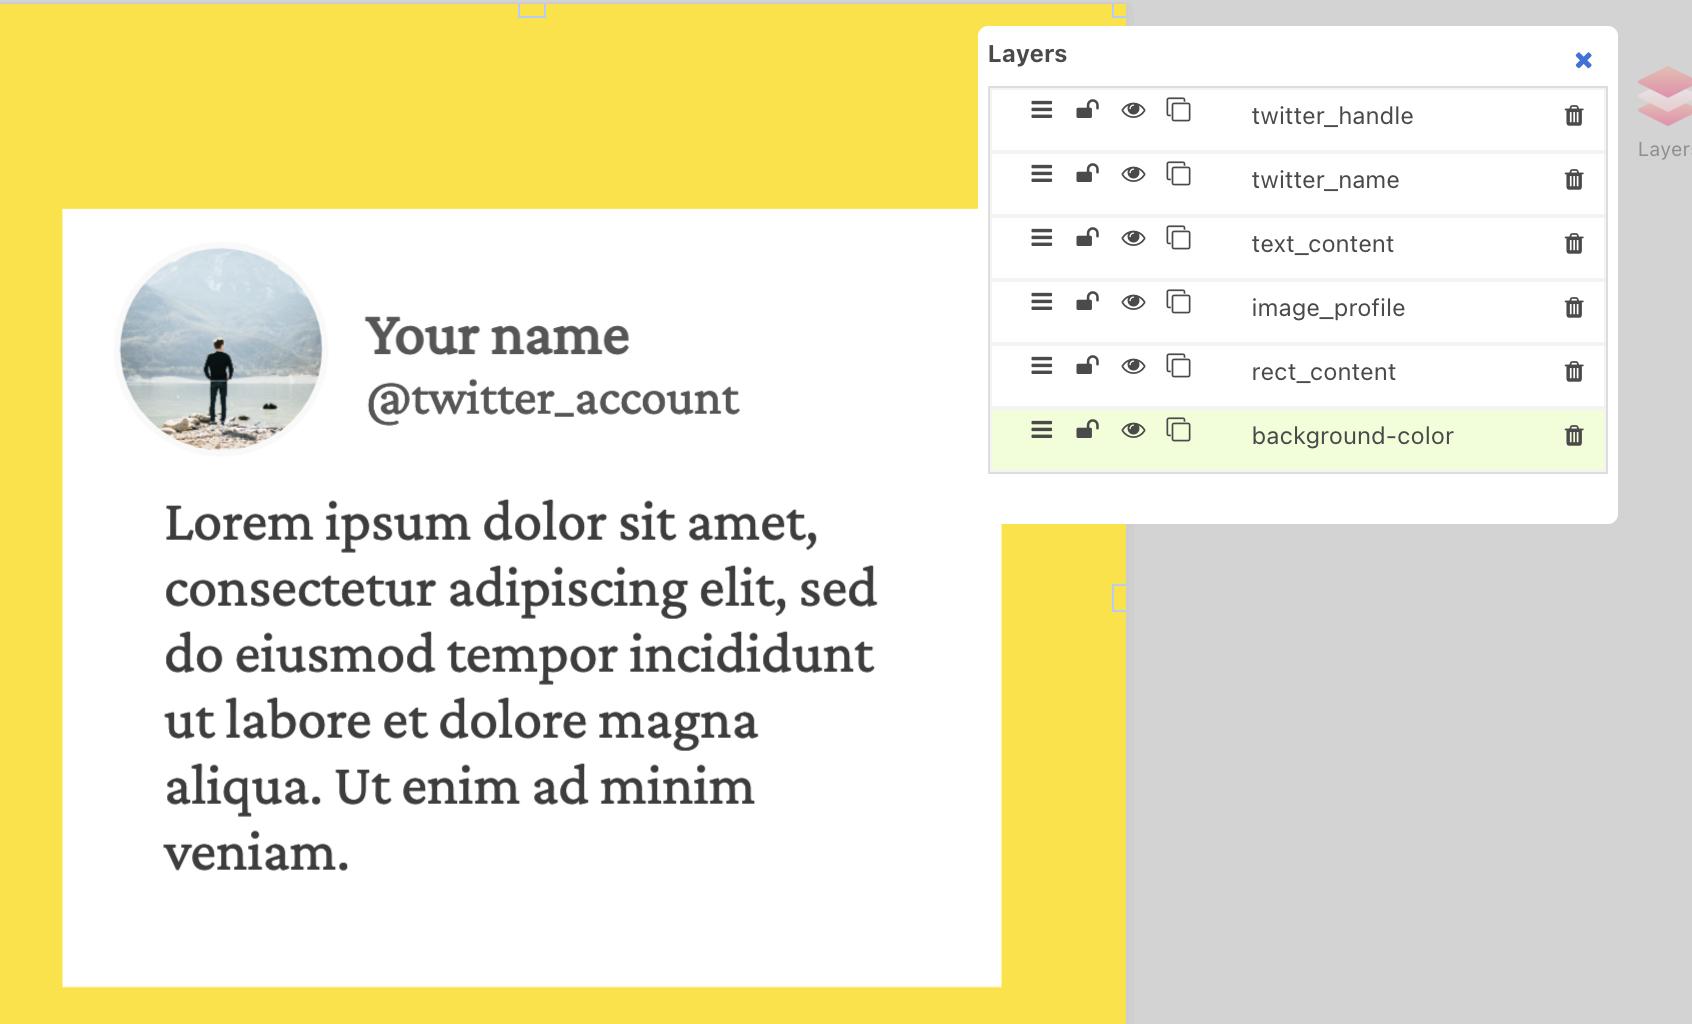 apitemplate-image-editor-layers